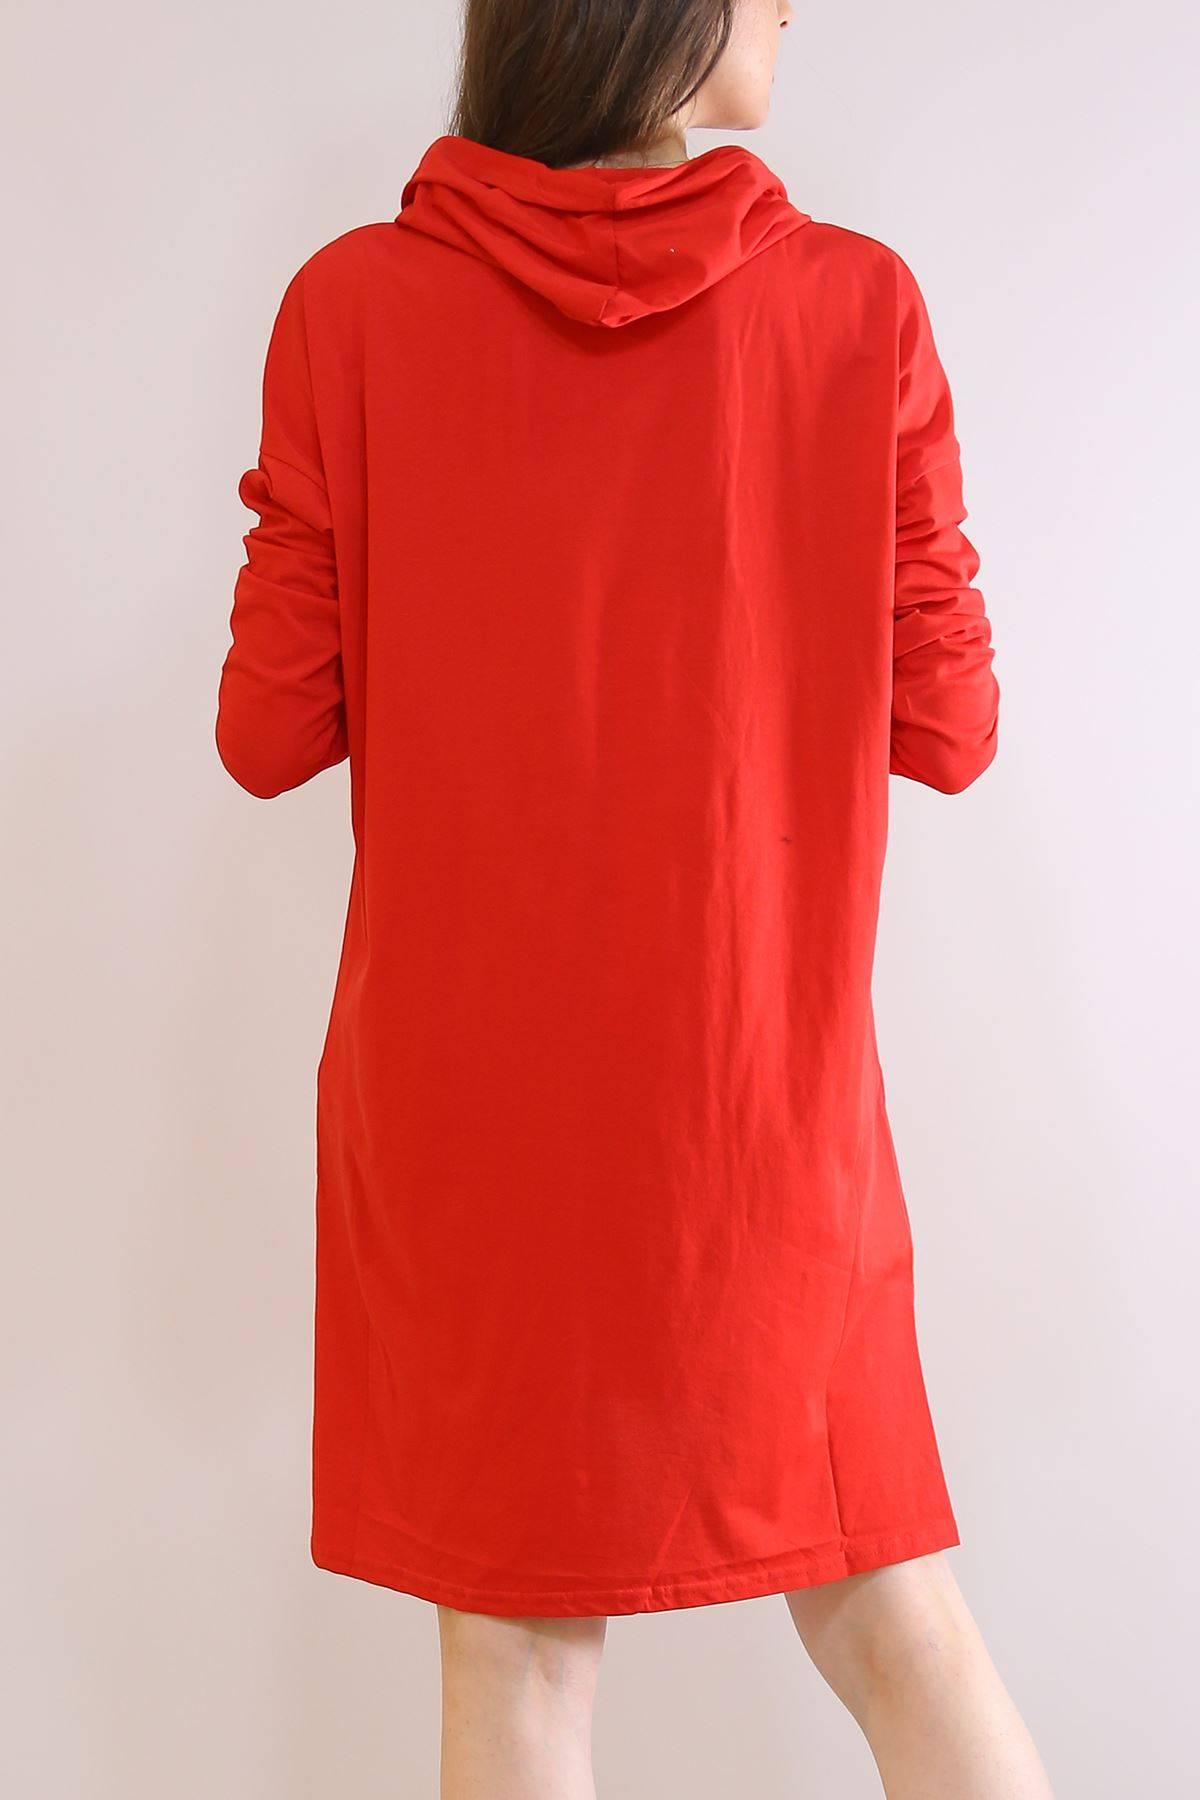 Kapüşonlu Penye Tunik Kırmızı - 2896.105.